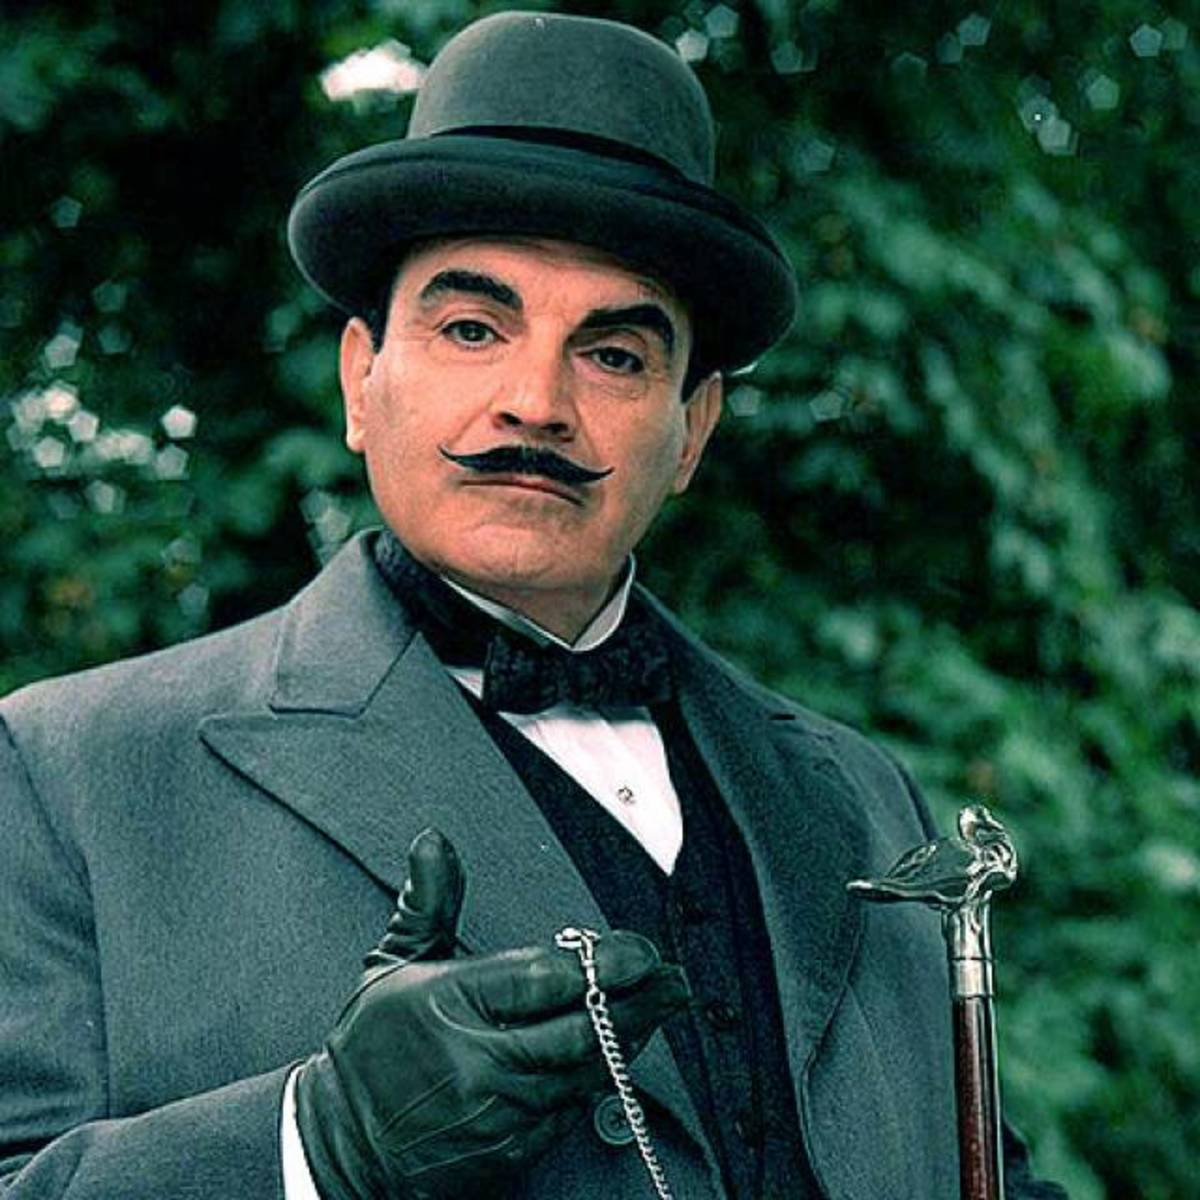 Hercule Poirot character